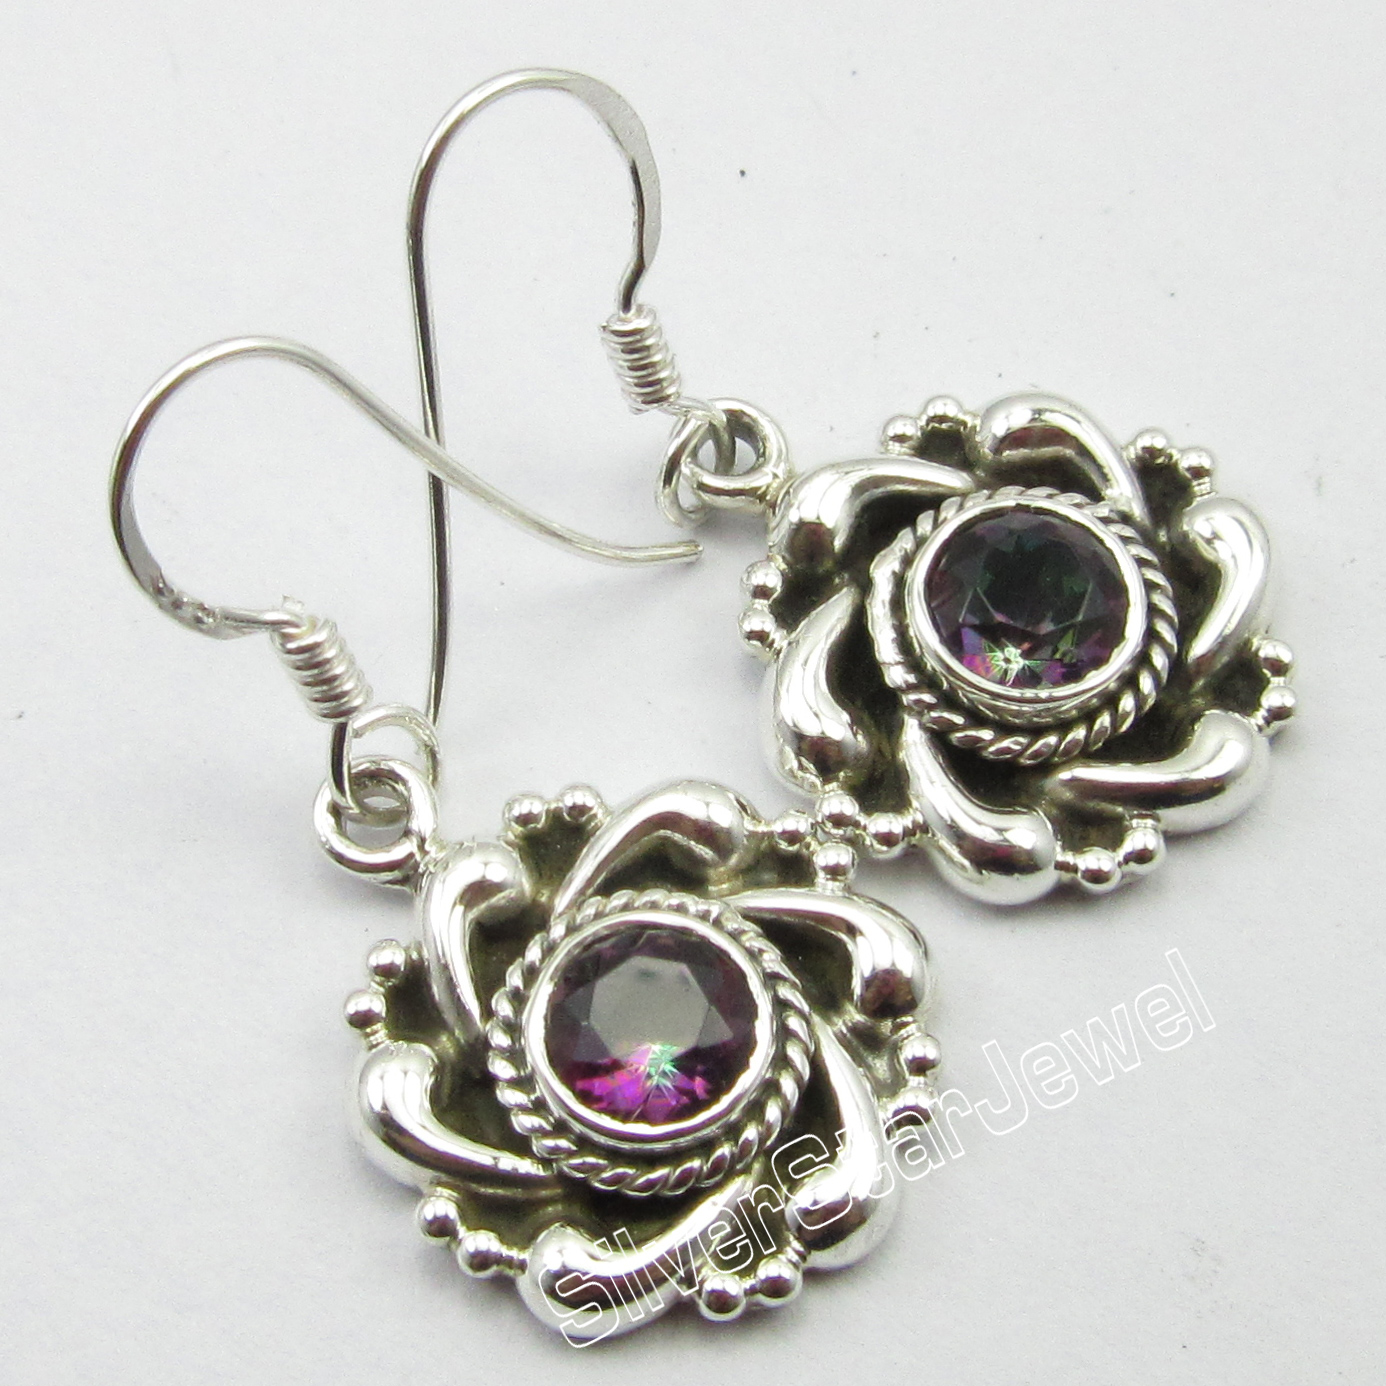 ③Chanti International Hot Selling ANCIENT STYLE Jewelry 6ef109d18432